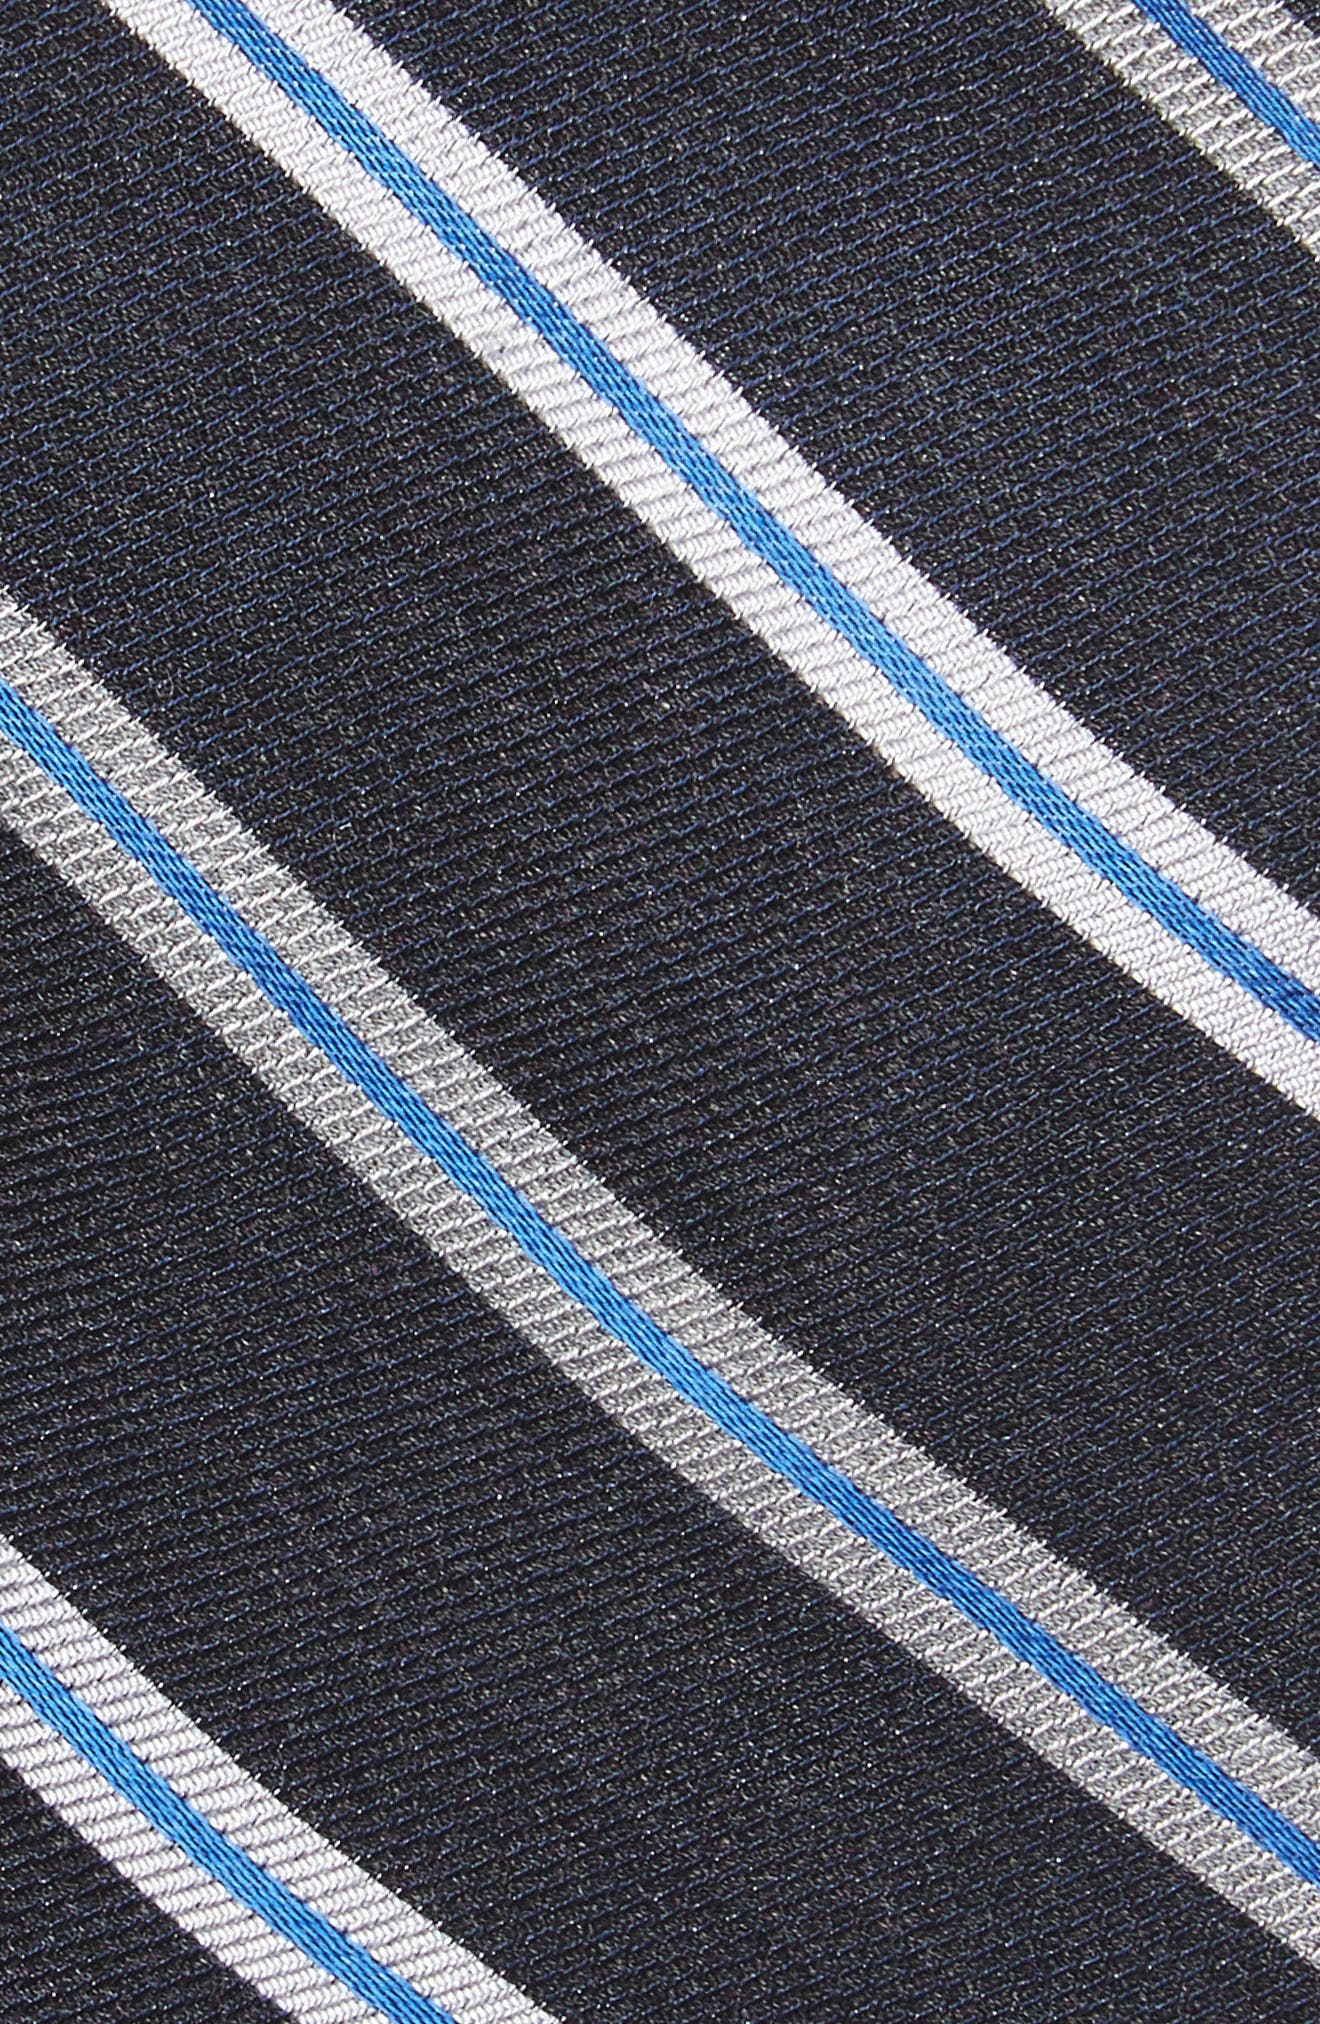 Crosby Stripe Silk Blend Tie,                             Alternate thumbnail 2, color,                             001